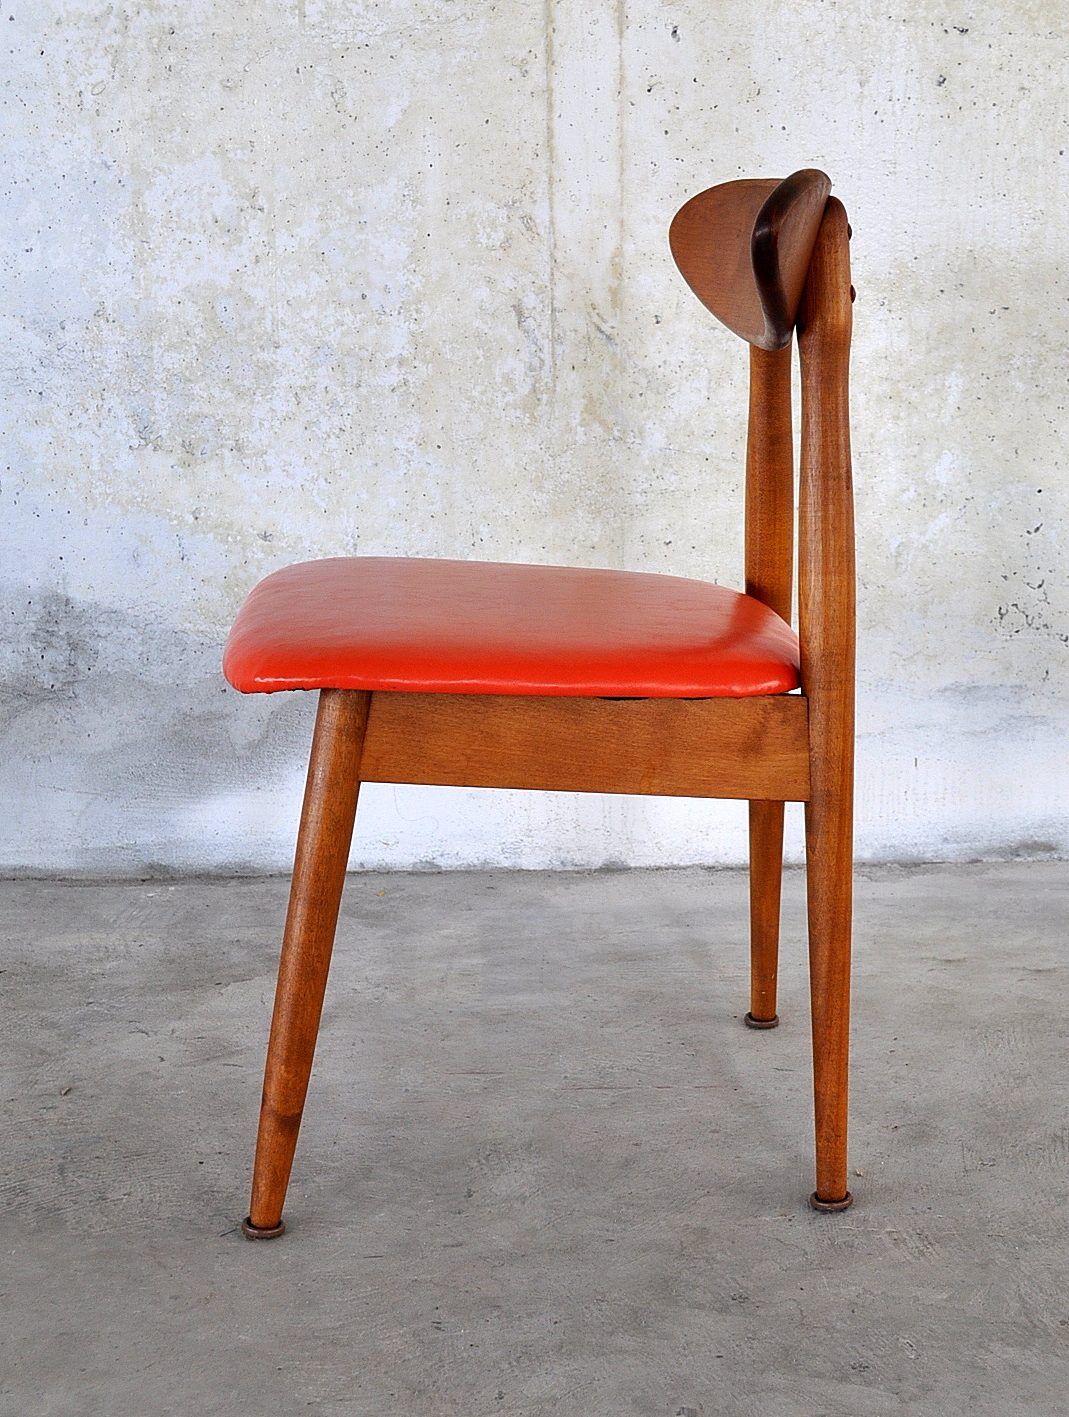 Conant Ball Chair Folding Director Chairs Aluminum Select Modern July 2013